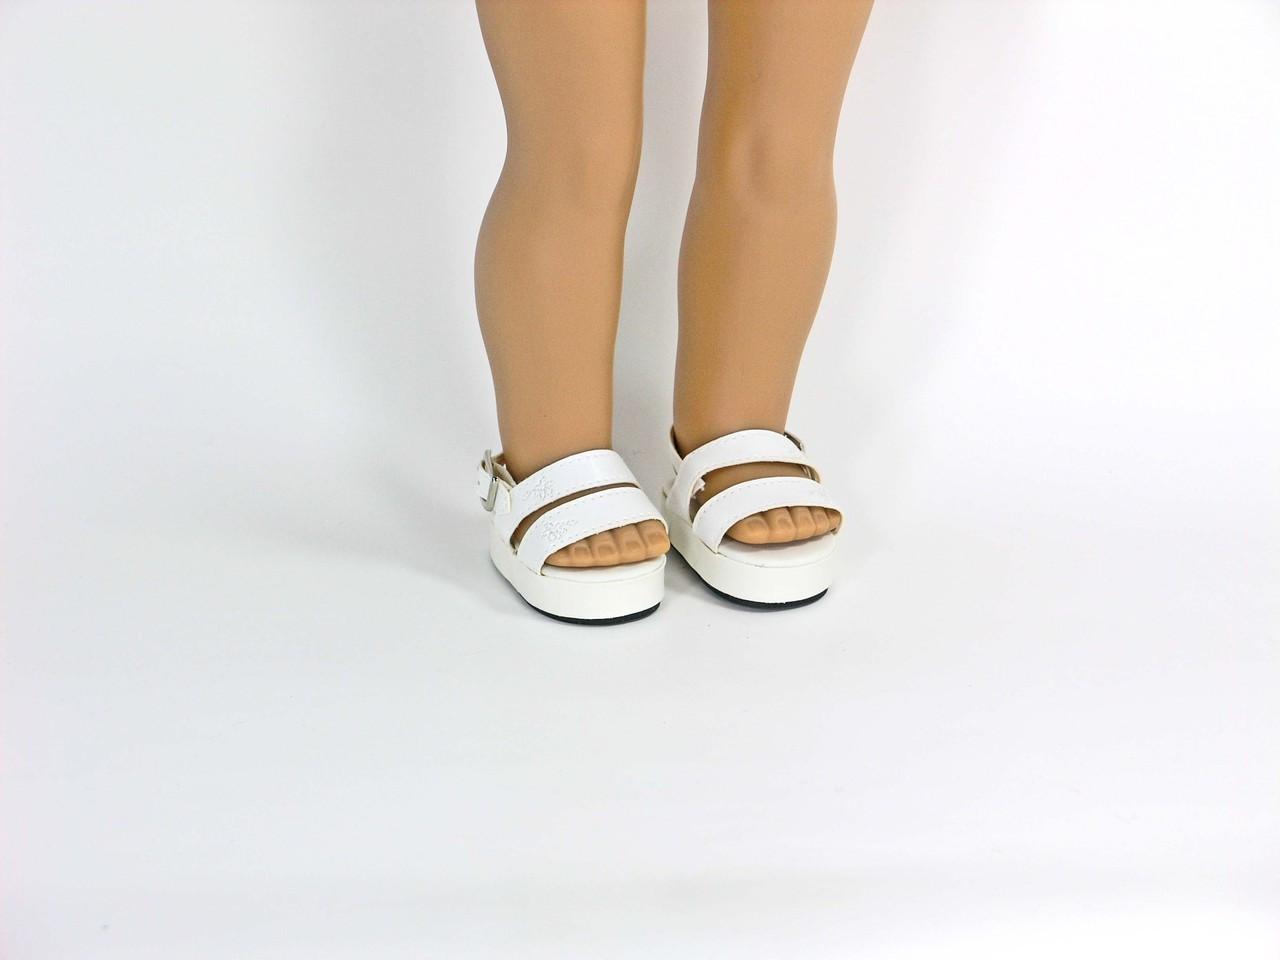 1d98fbec9f6ca White Platform Doll Sandals for 18 inch American Girl, Madame Alexander